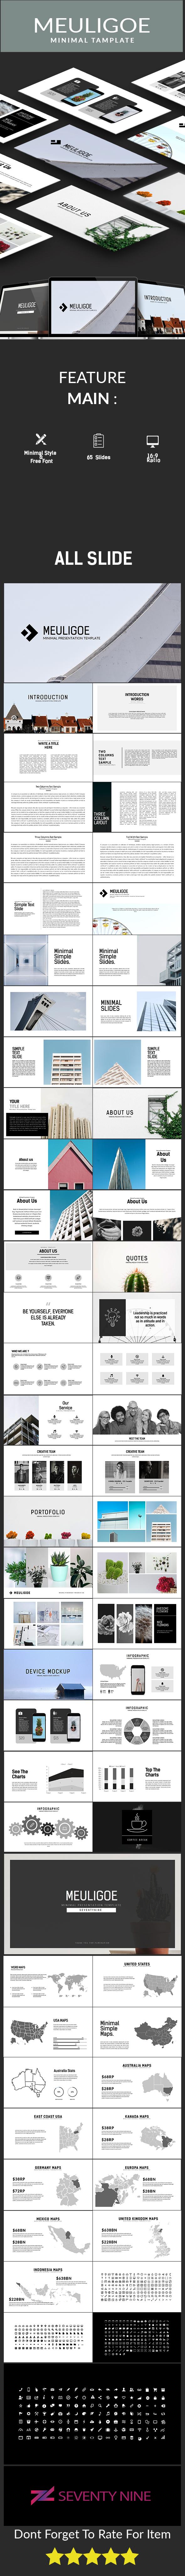 Meuligoe Google Slide Presentation Template - Google Slides Presentation Templates